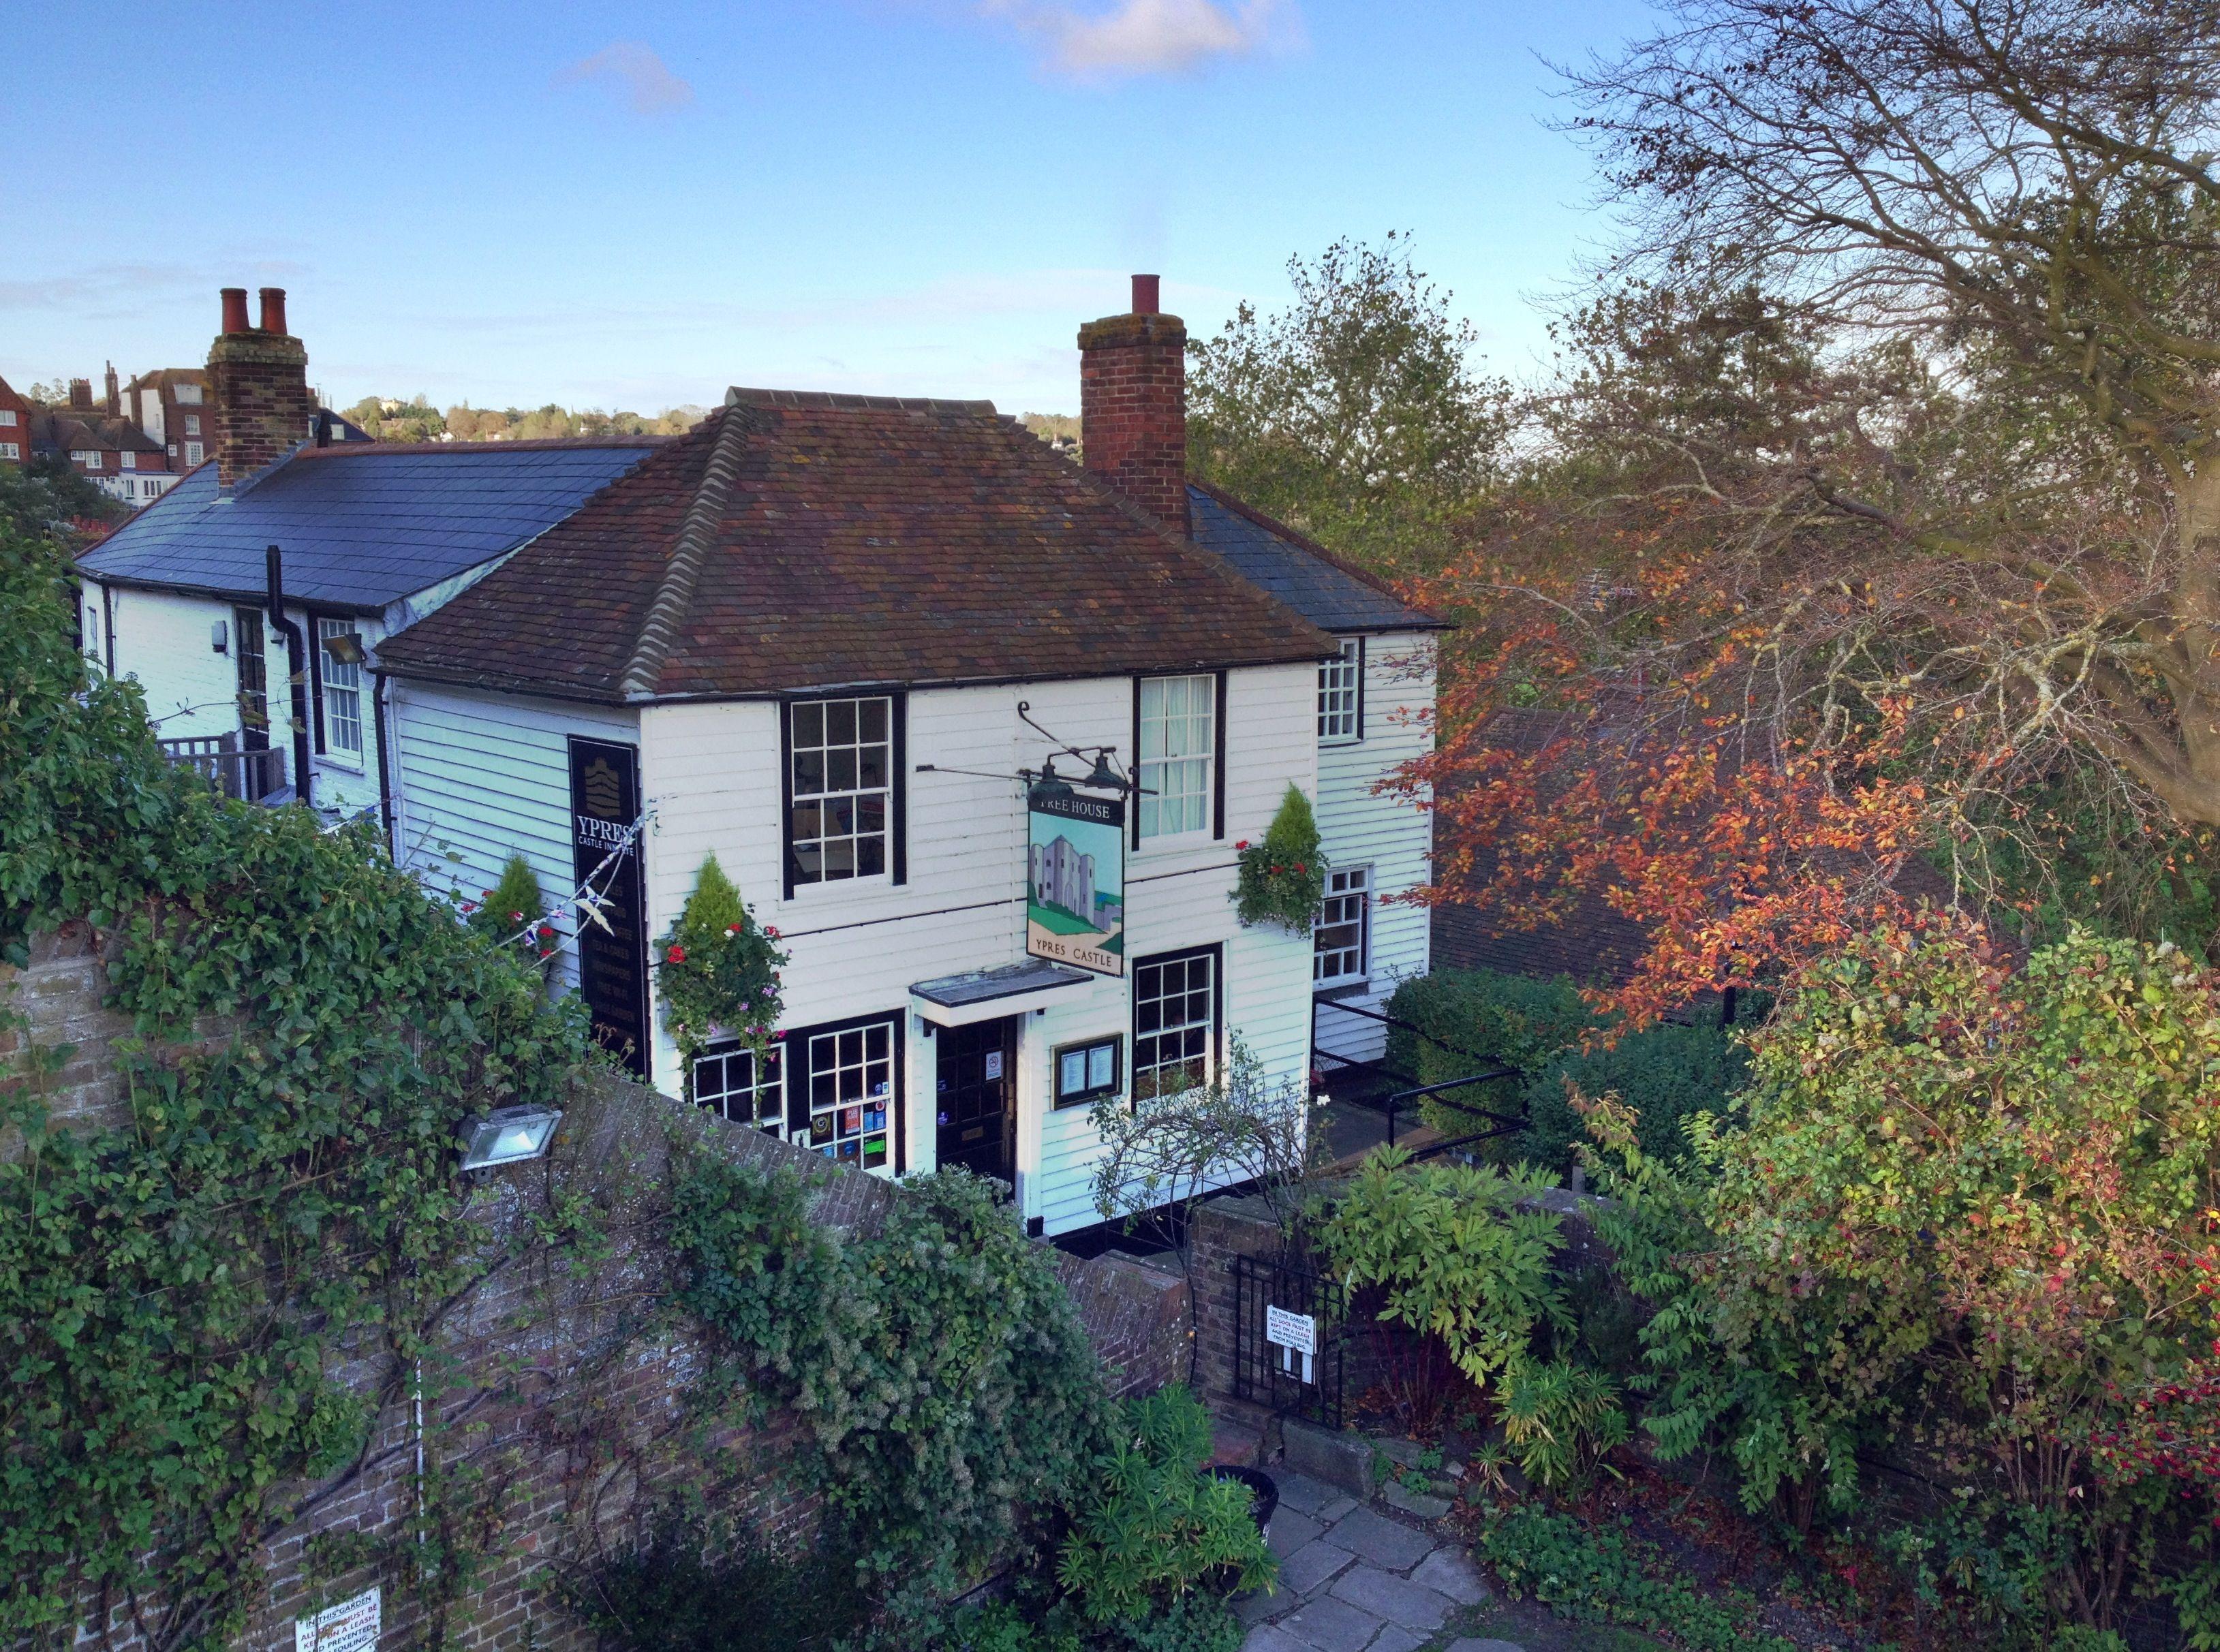 386e4011ff214ad0b61d920e96ded60f - Pubs In West Sussex With Gardens